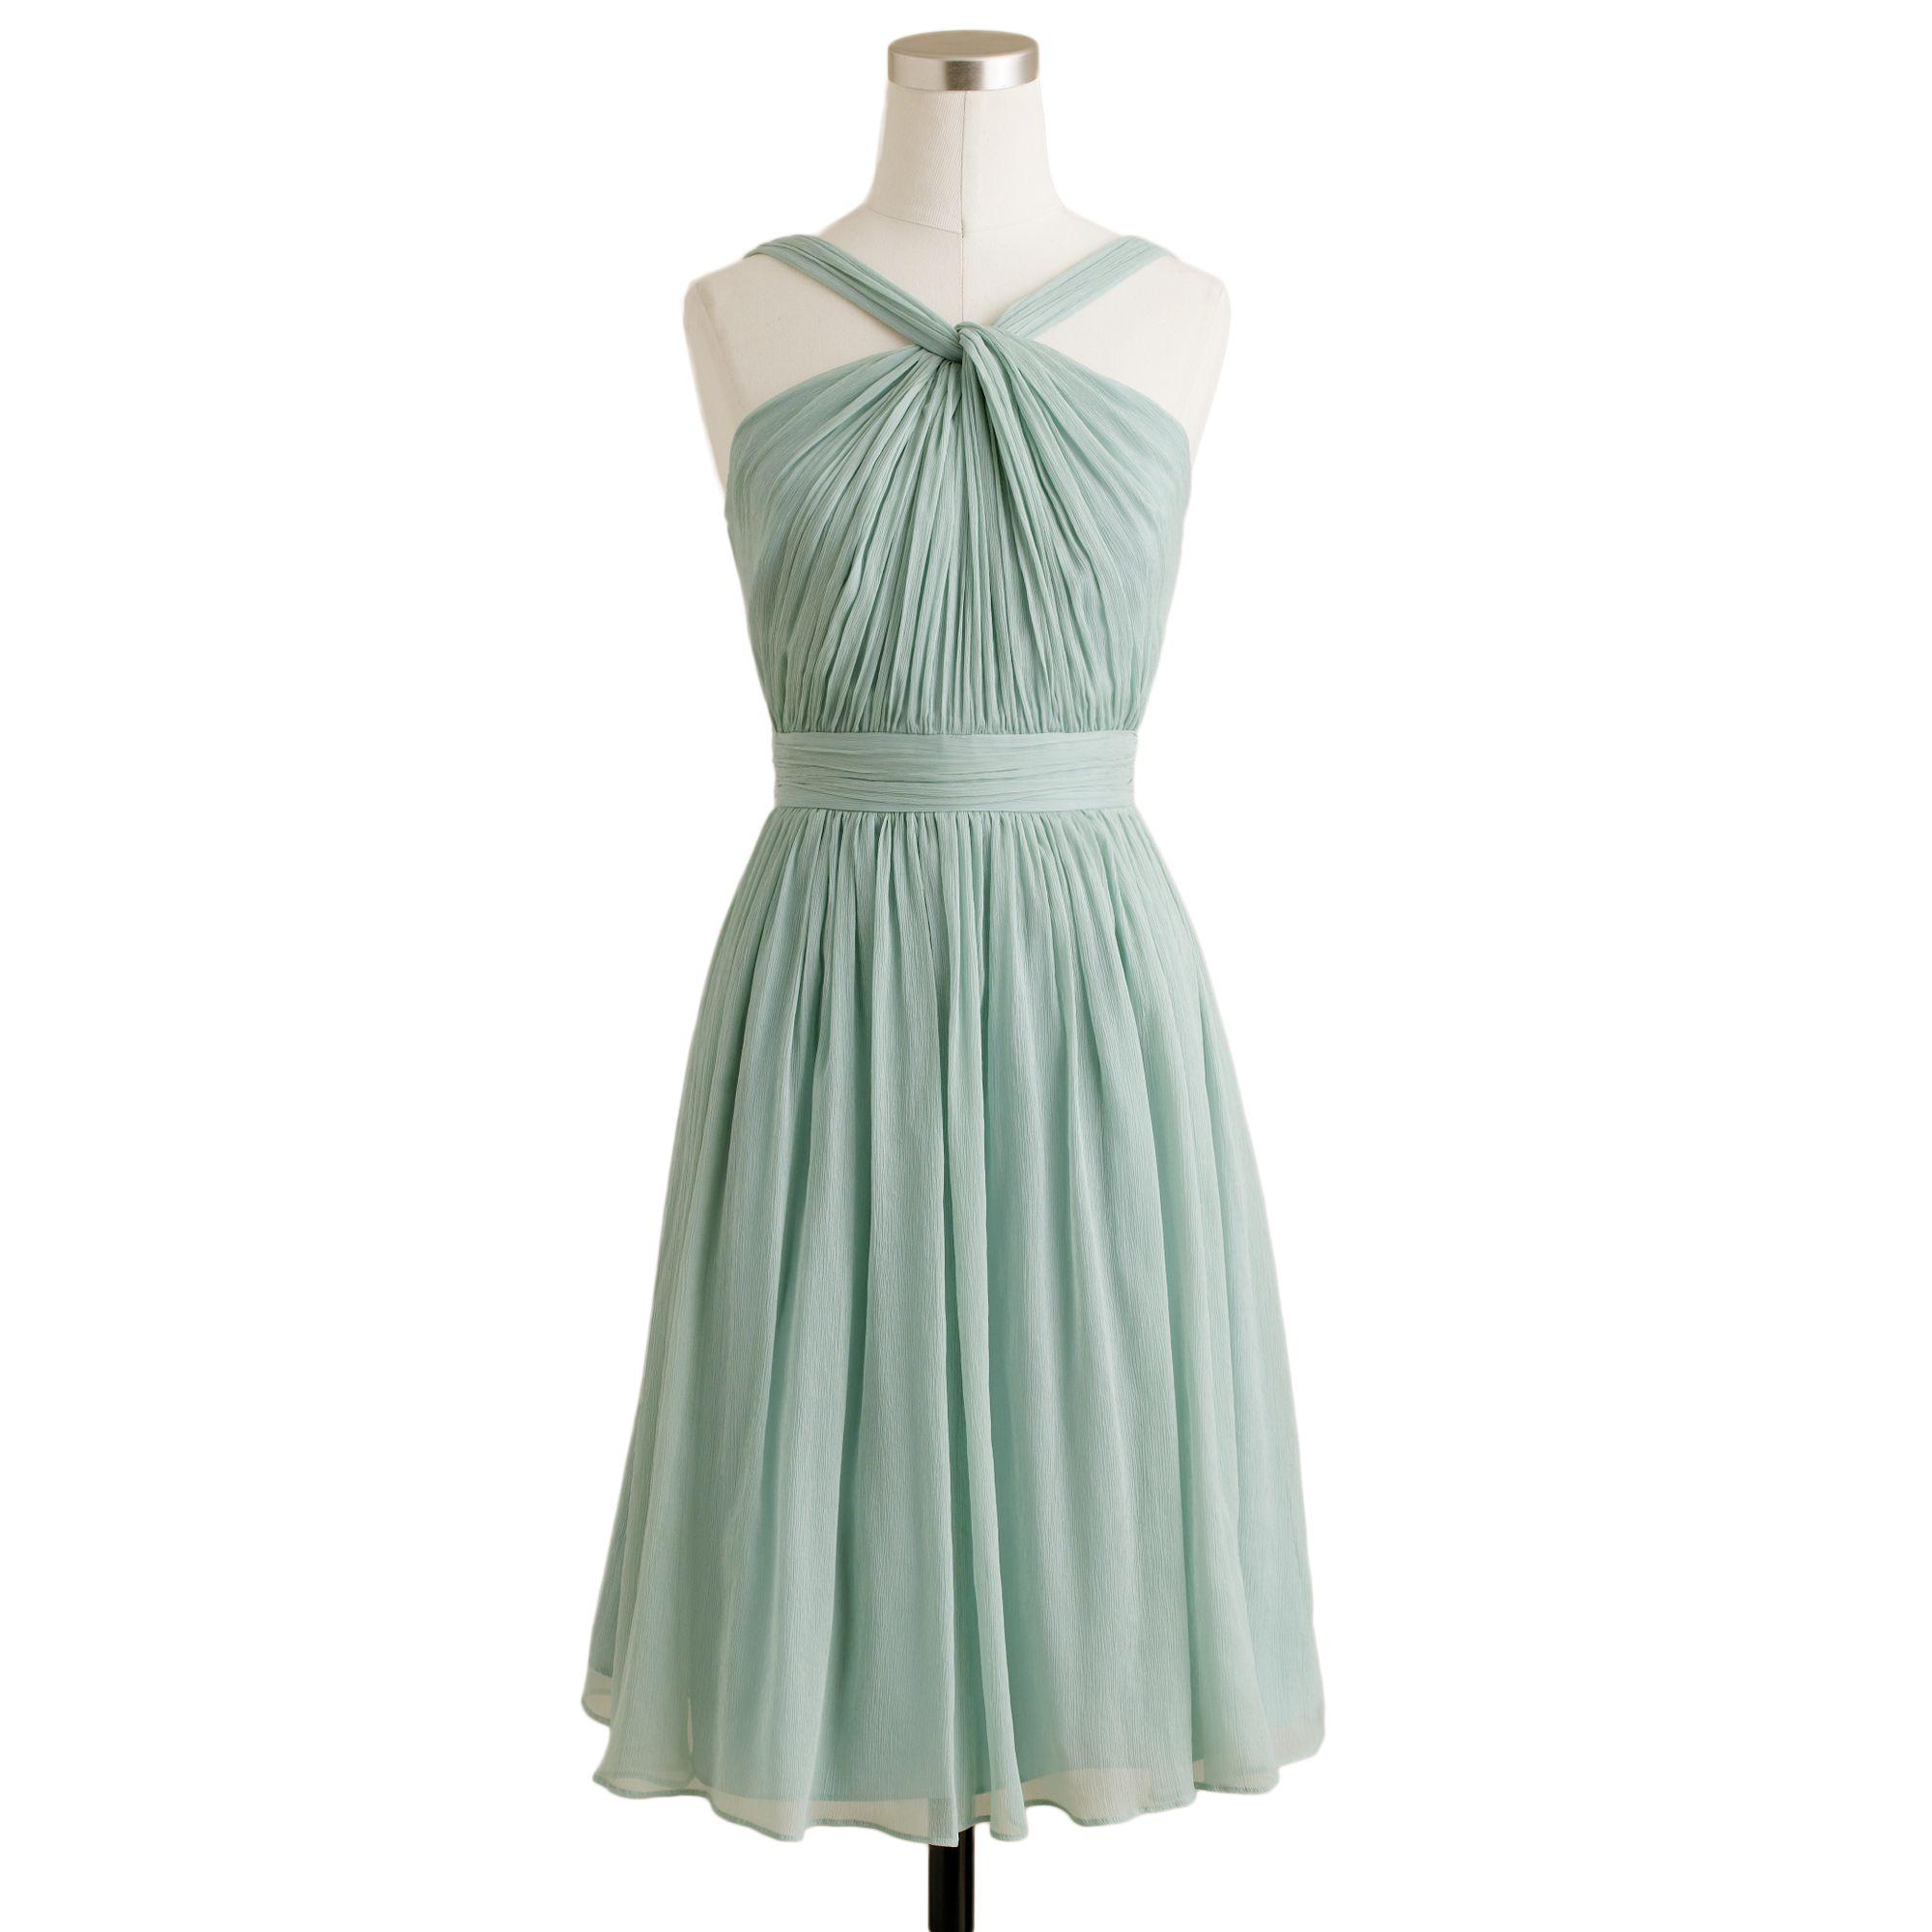 Lyst - J.Crew Petite Sinclair Dress in Silk Chiffon in Green